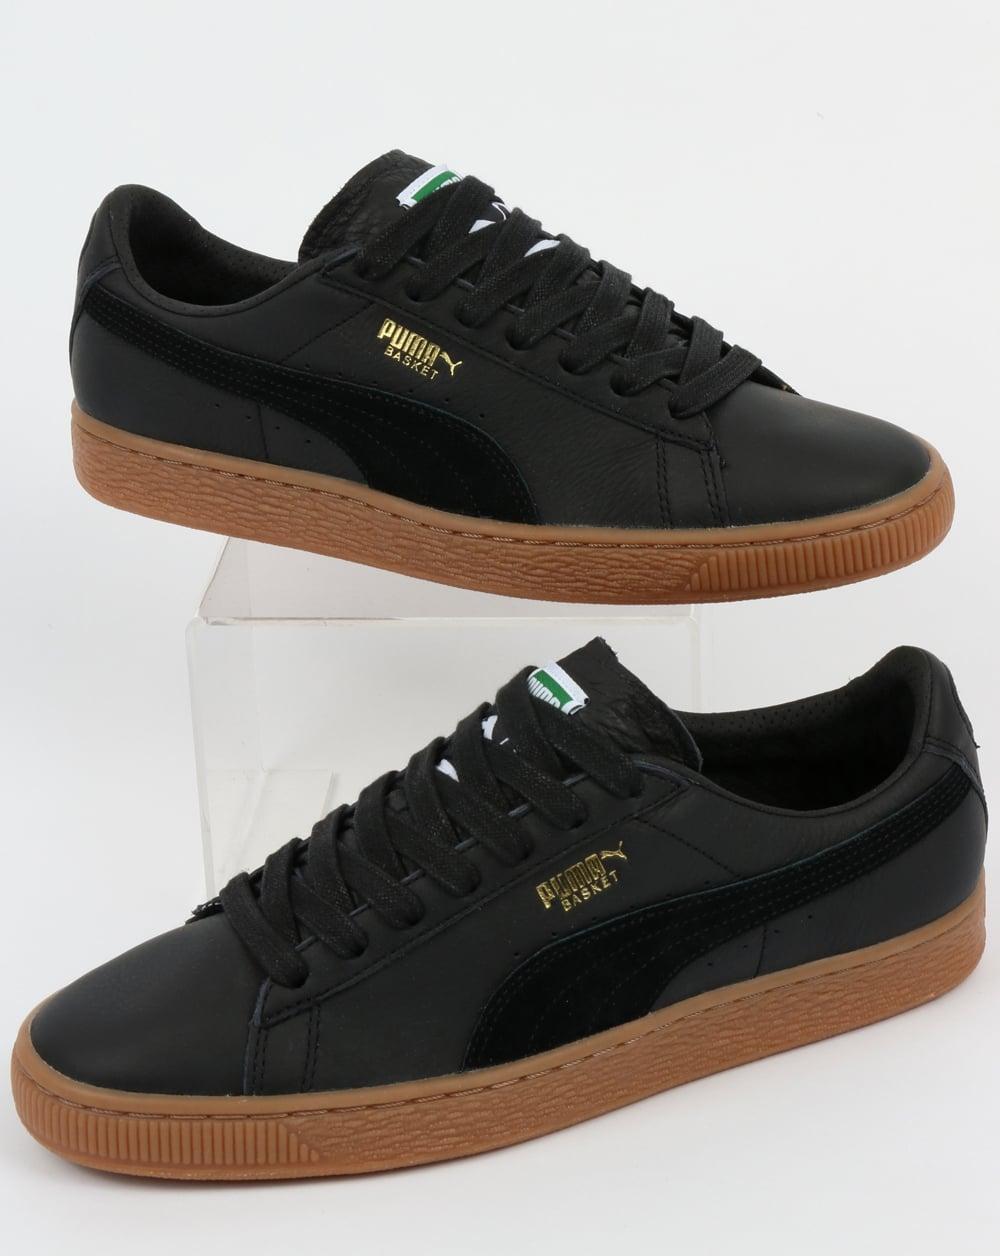 puma basket leather trainers